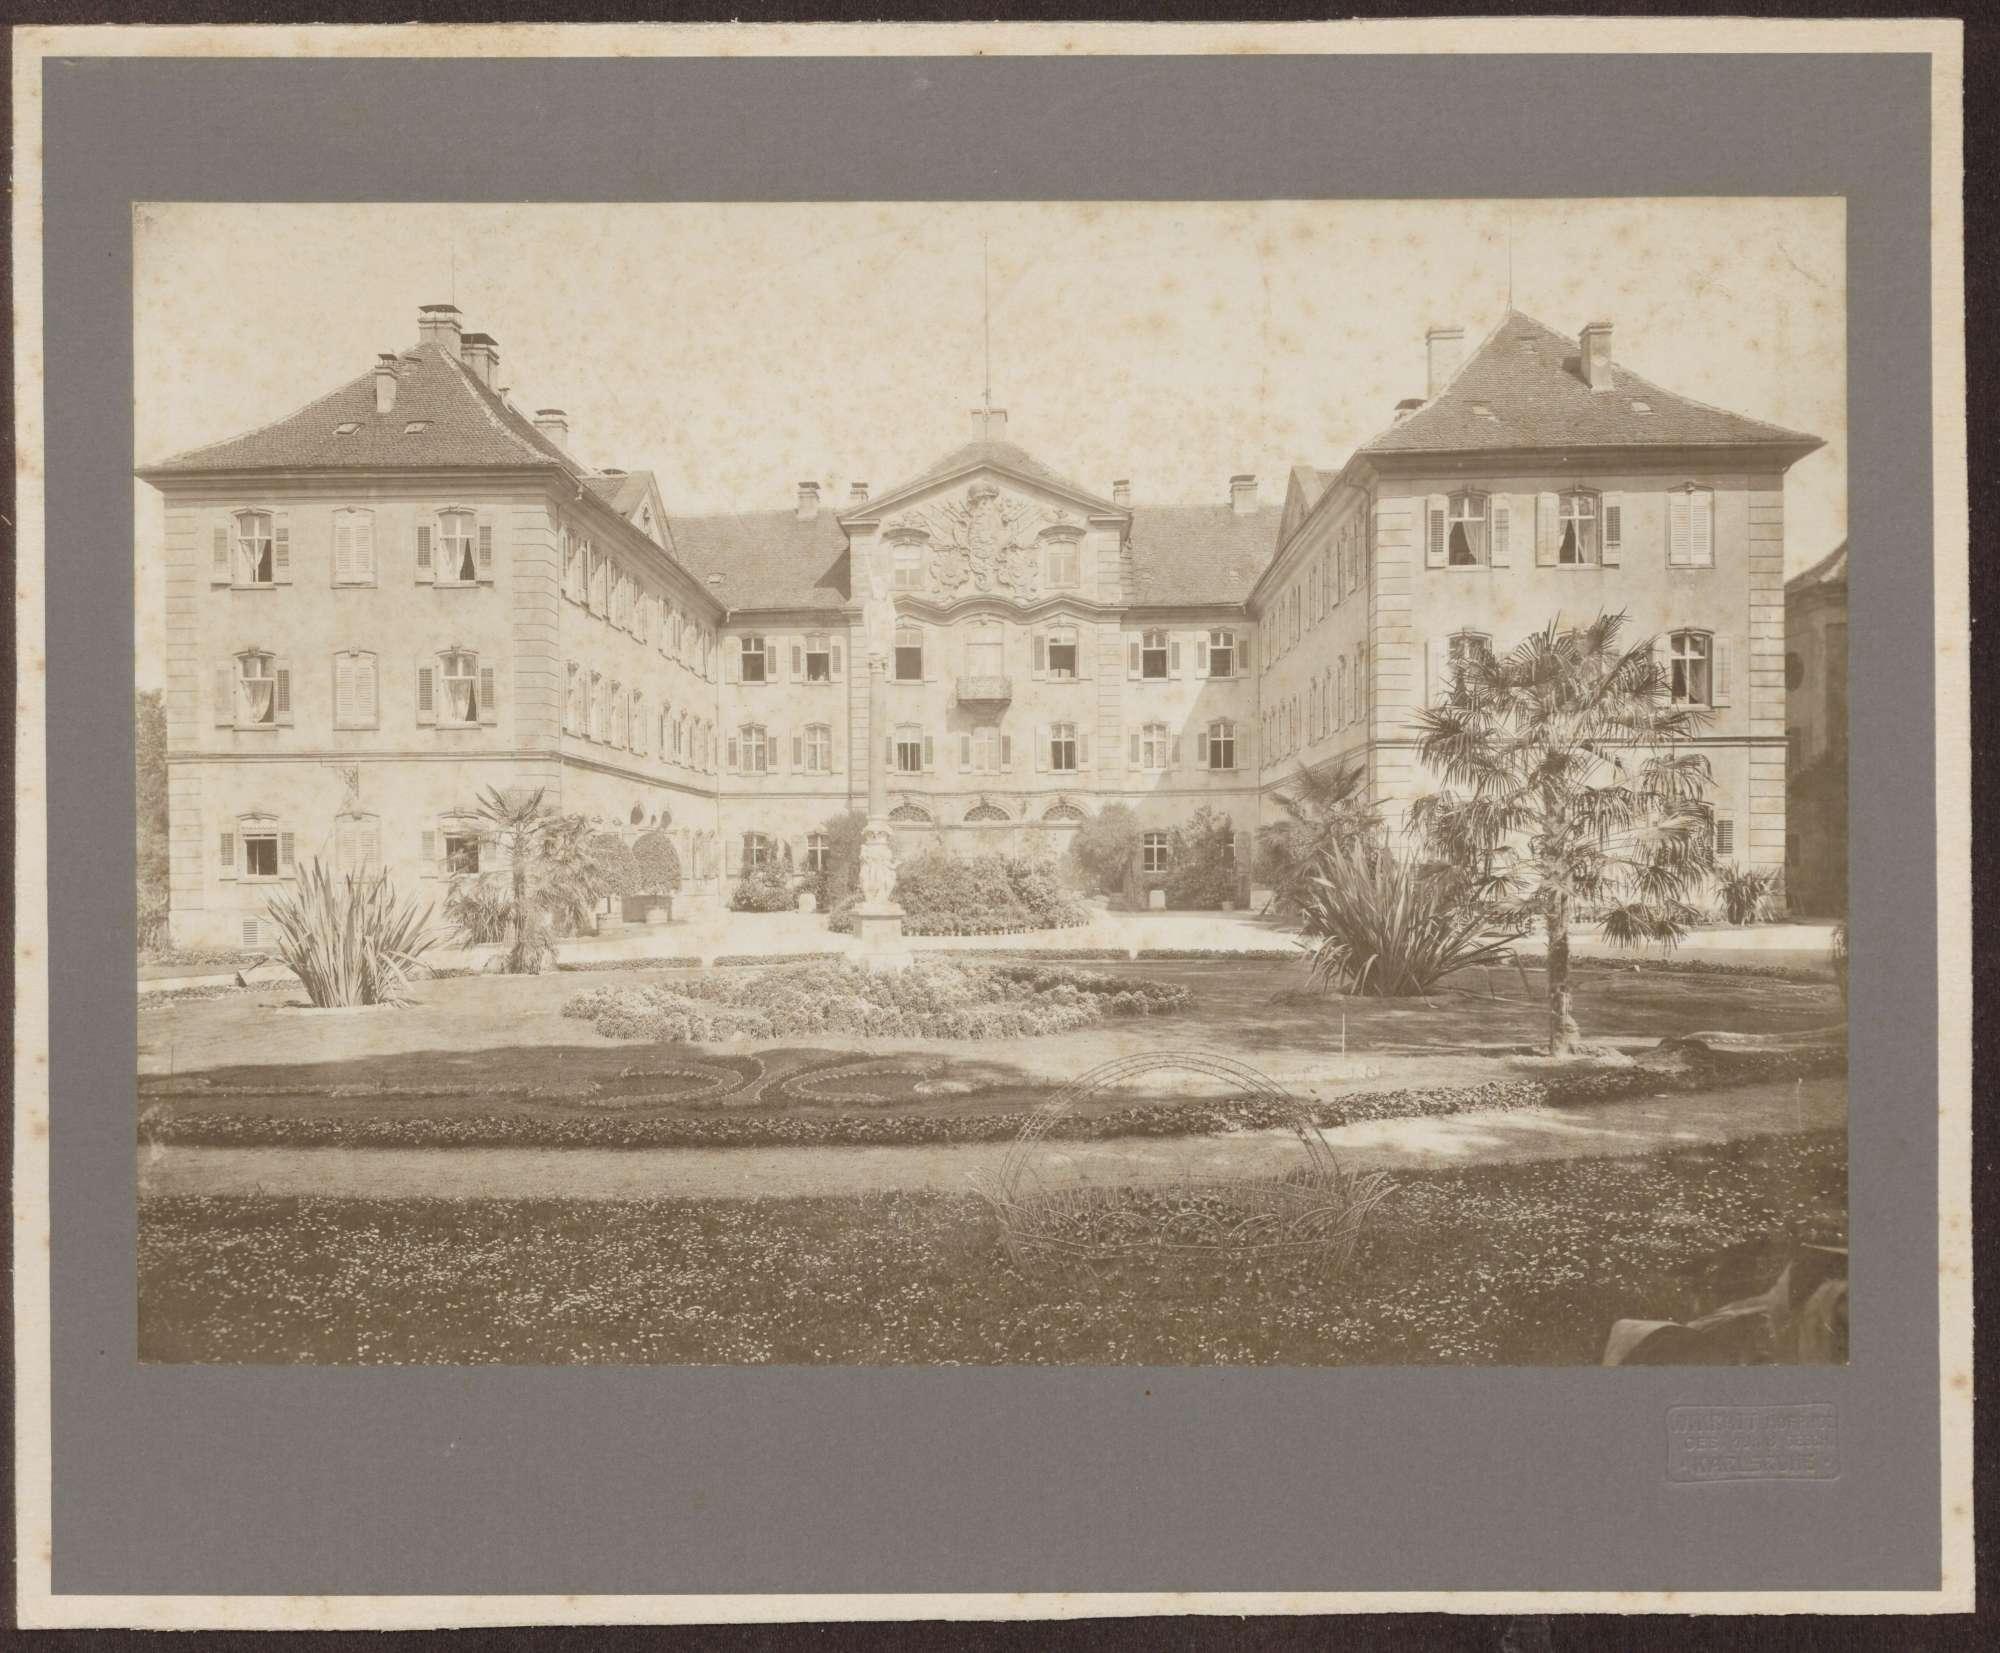 Gesamtansicht des Schlosses., Bild 1